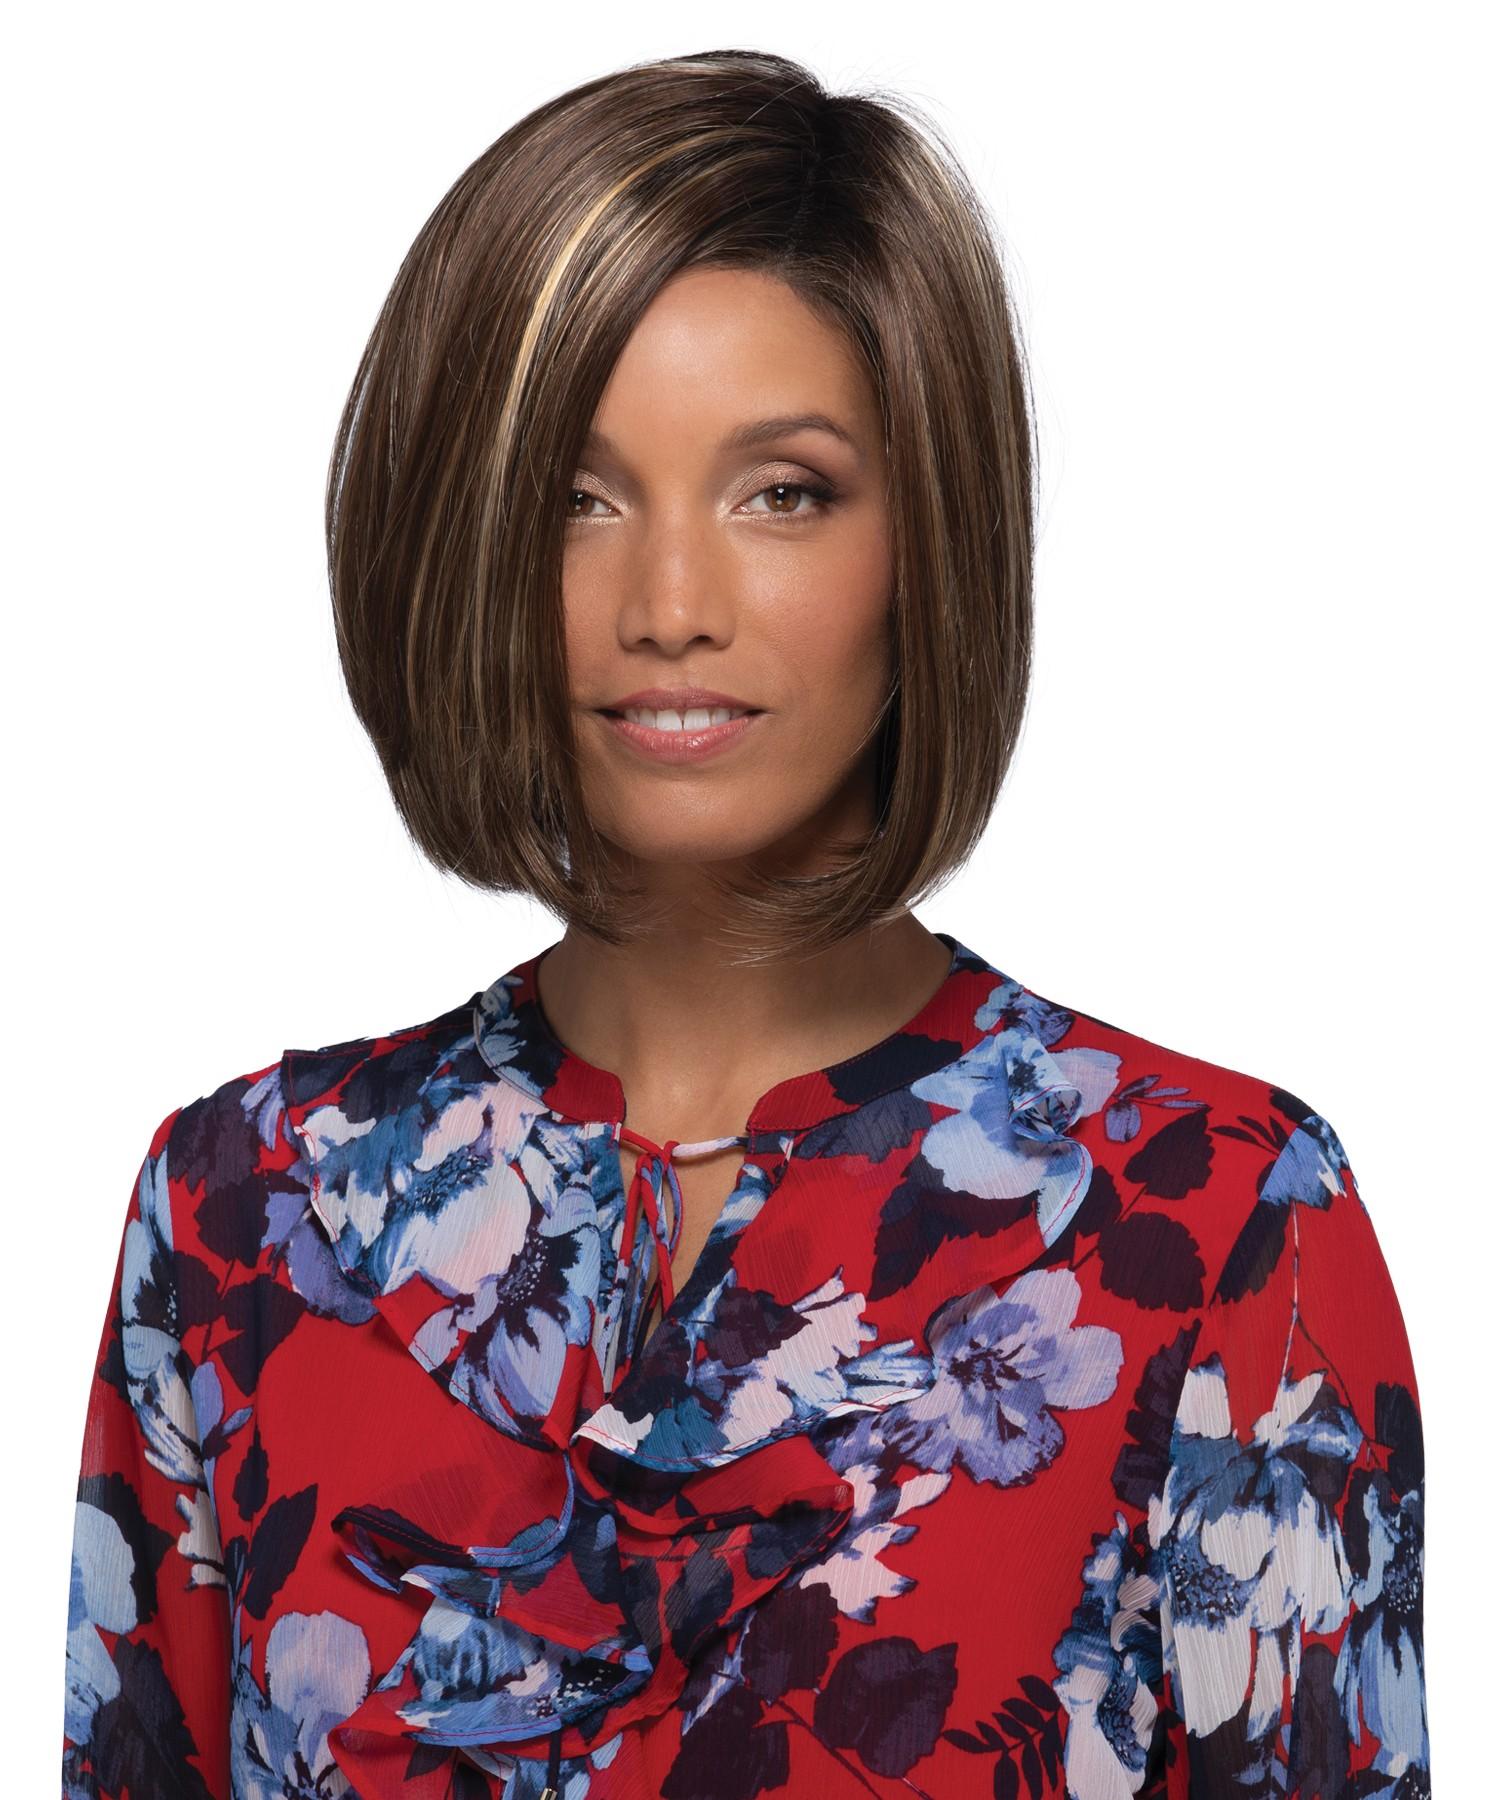 Petite Sullivan_Front, Naturalle Collection by Estetica Designs Wigs, Color Shown is CKISSRT4